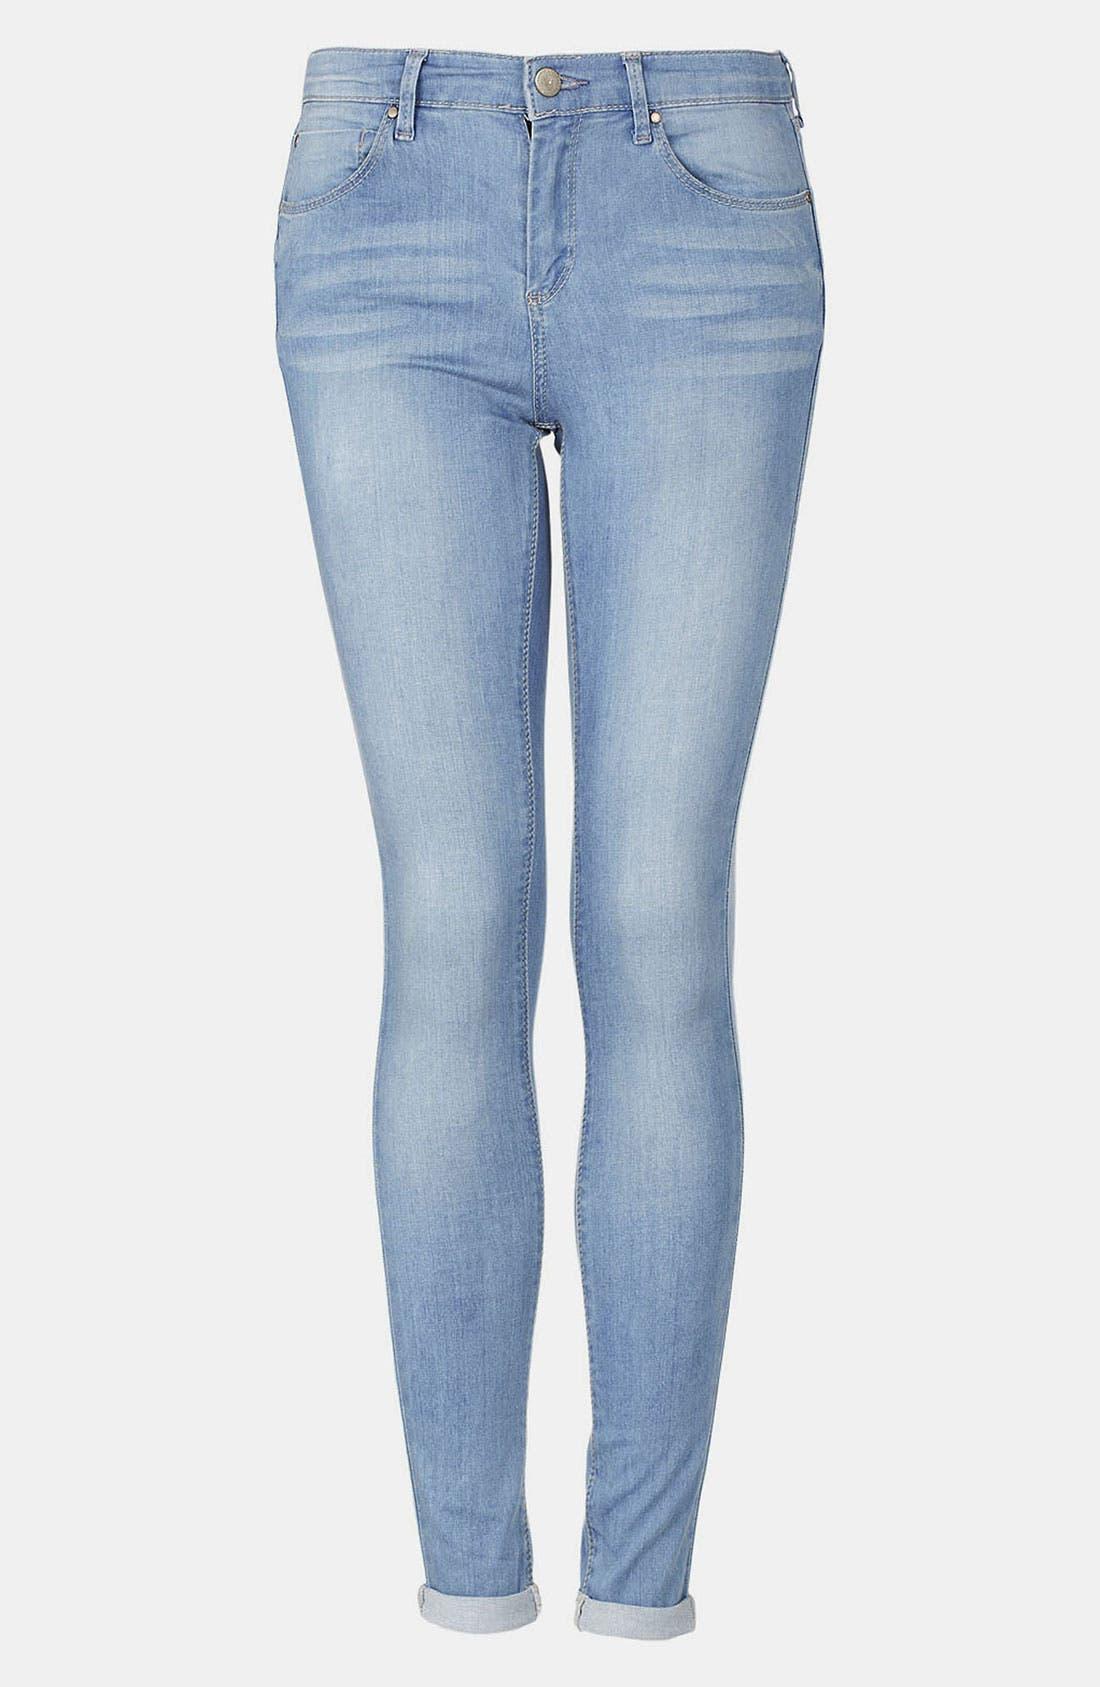 Alternate Image 1 Selected - Topshop Moto 'Leigh' Bleach Wash Skinny Jeans (Regular & Short)